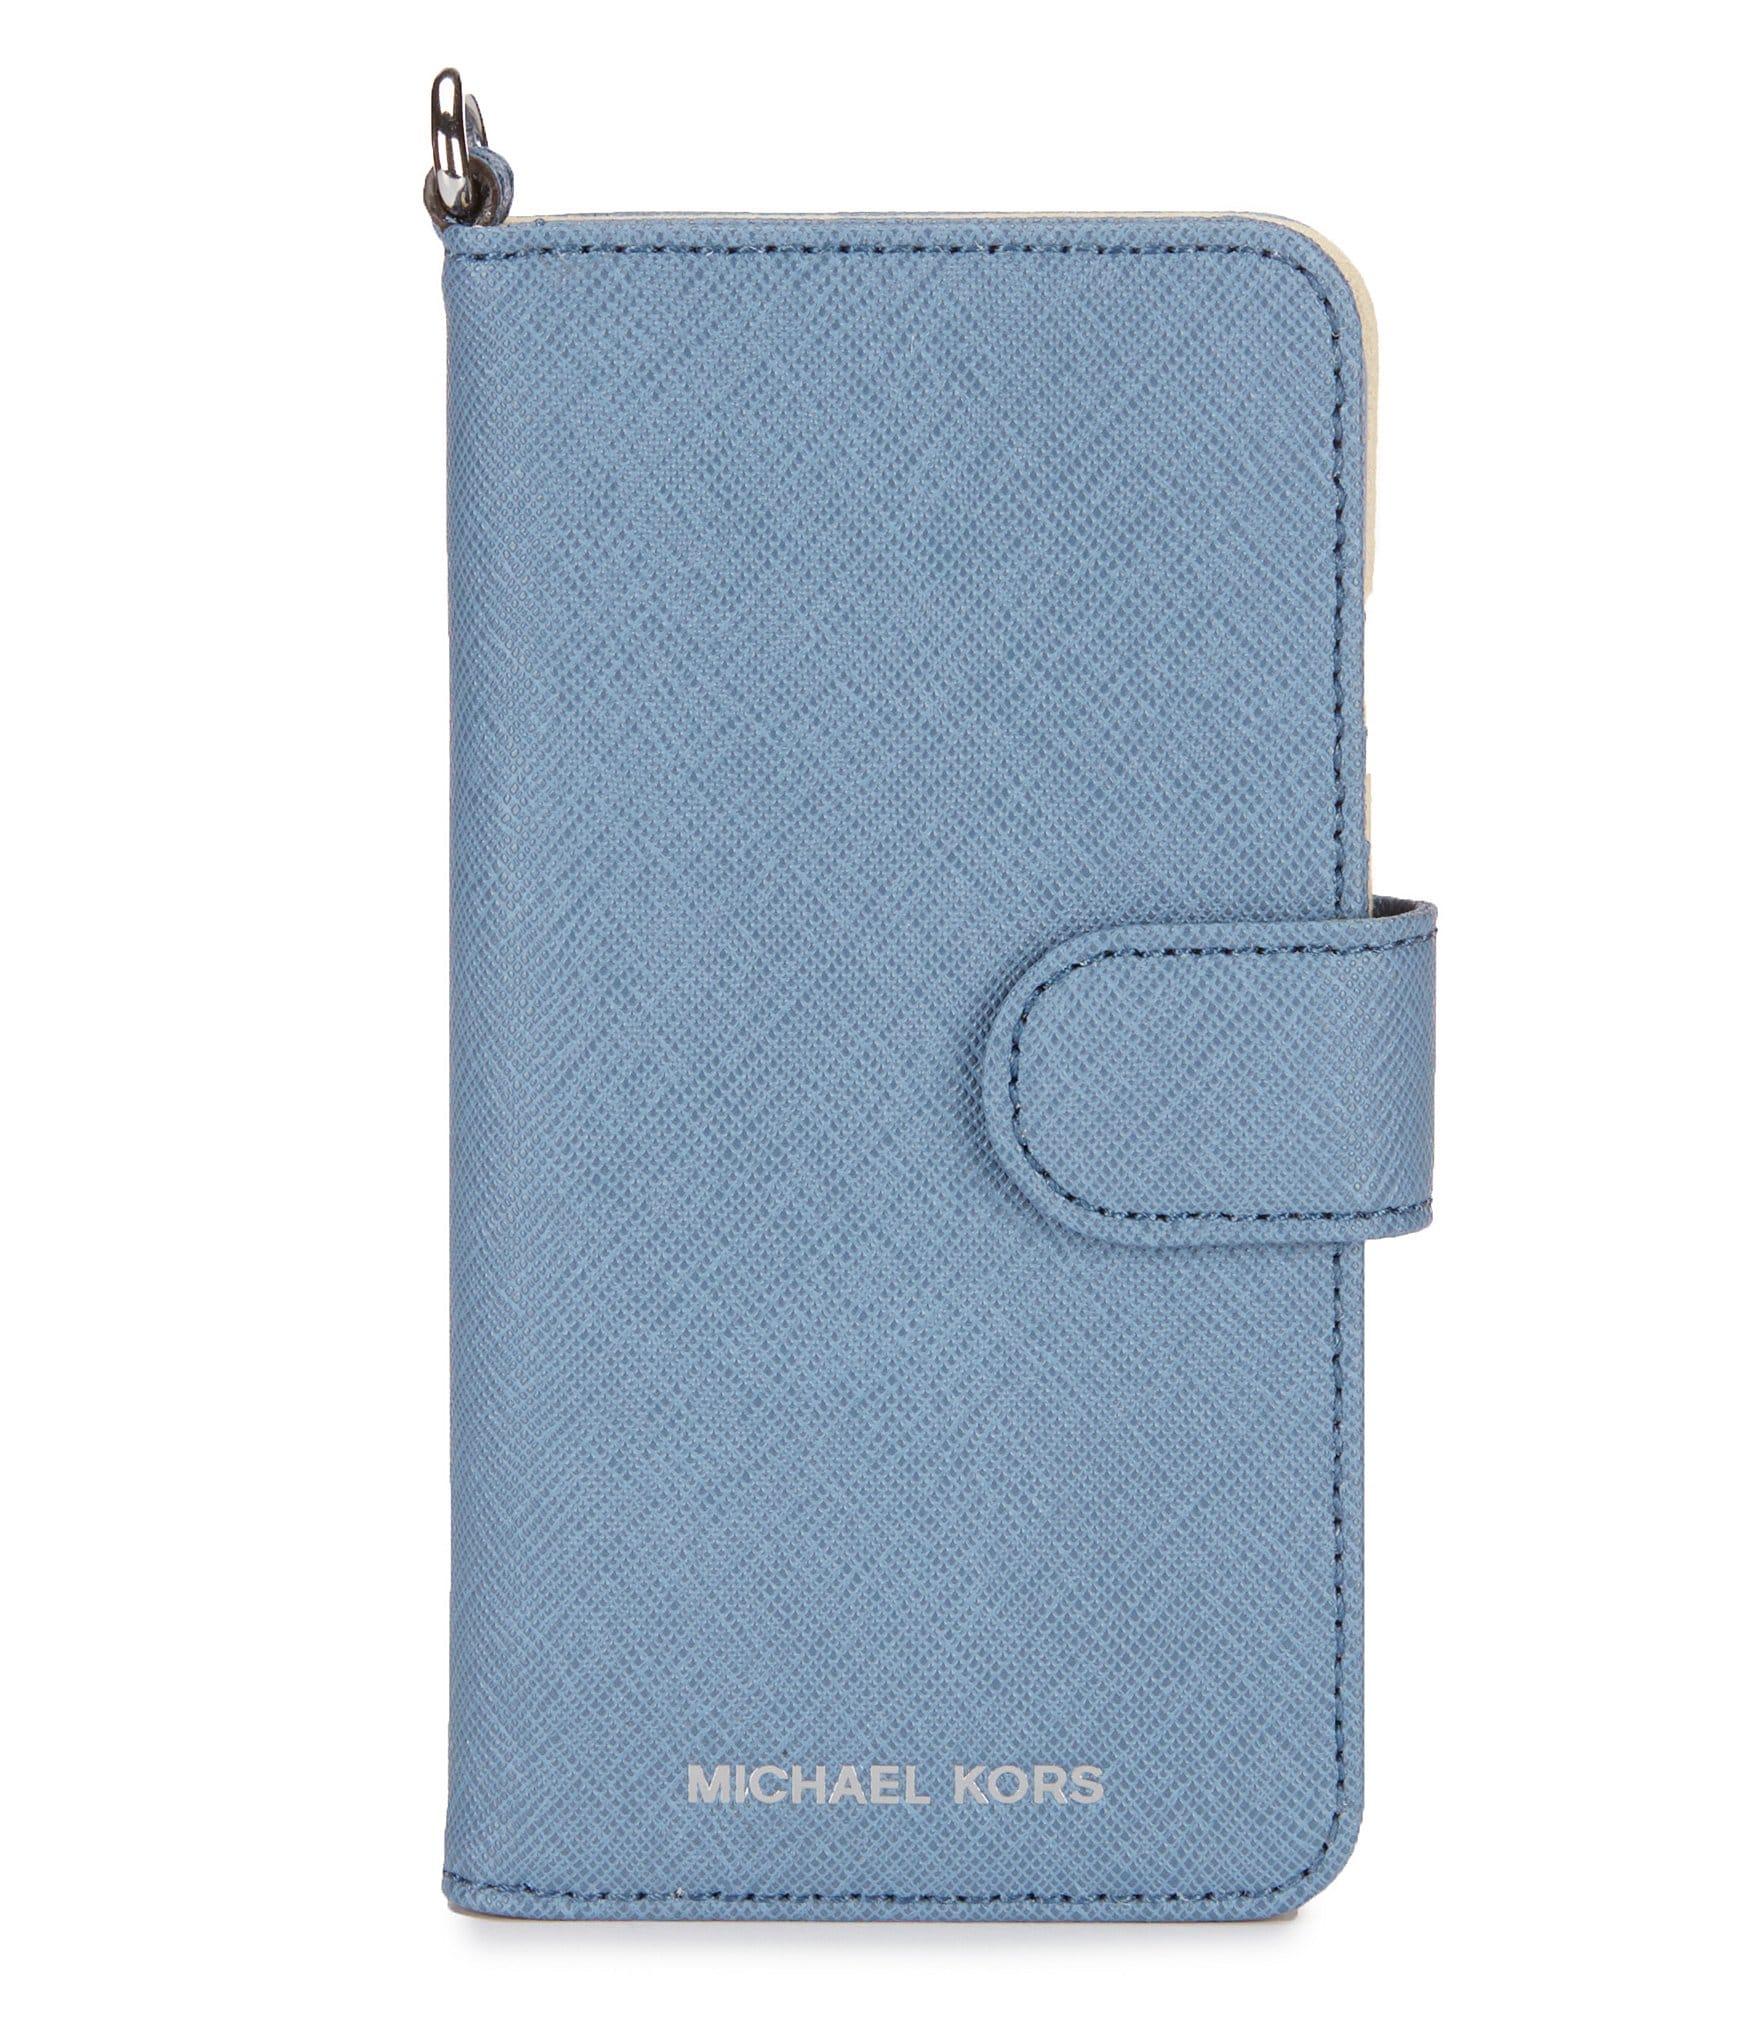 michael michael kors iphone 7 folio case dillards. Black Bedroom Furniture Sets. Home Design Ideas